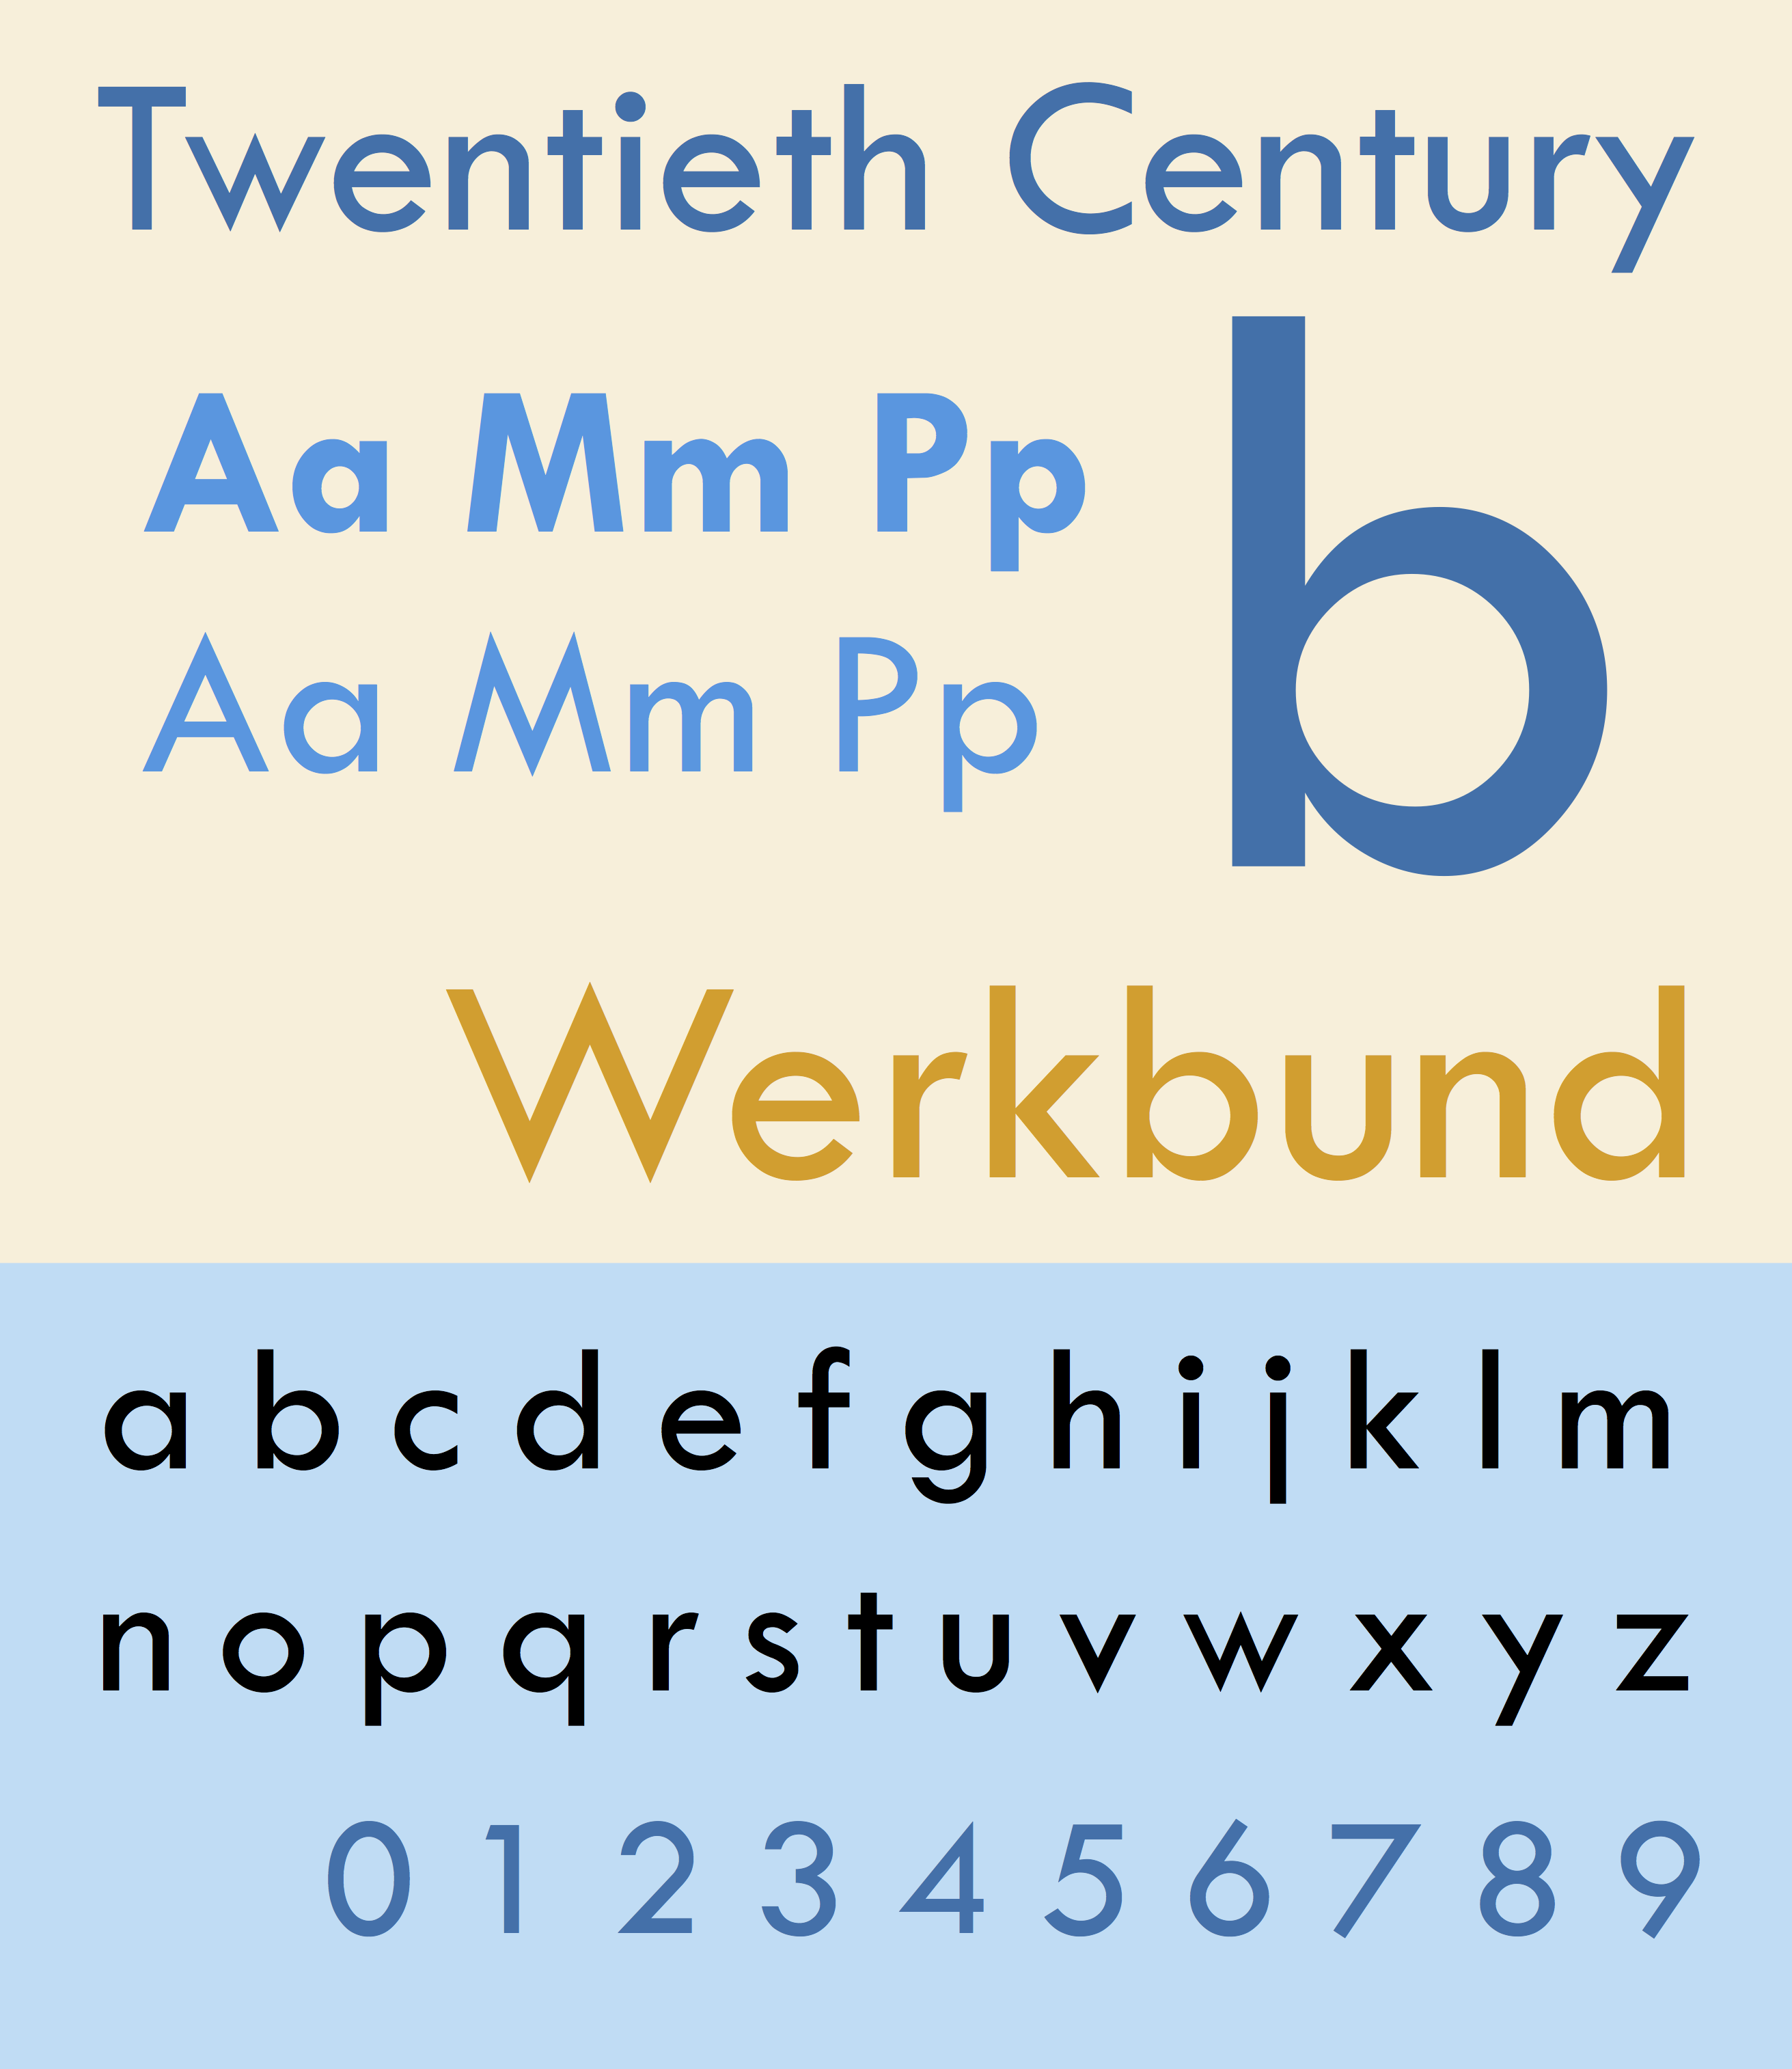 Twentieth Century (typeface) - Wikipedia